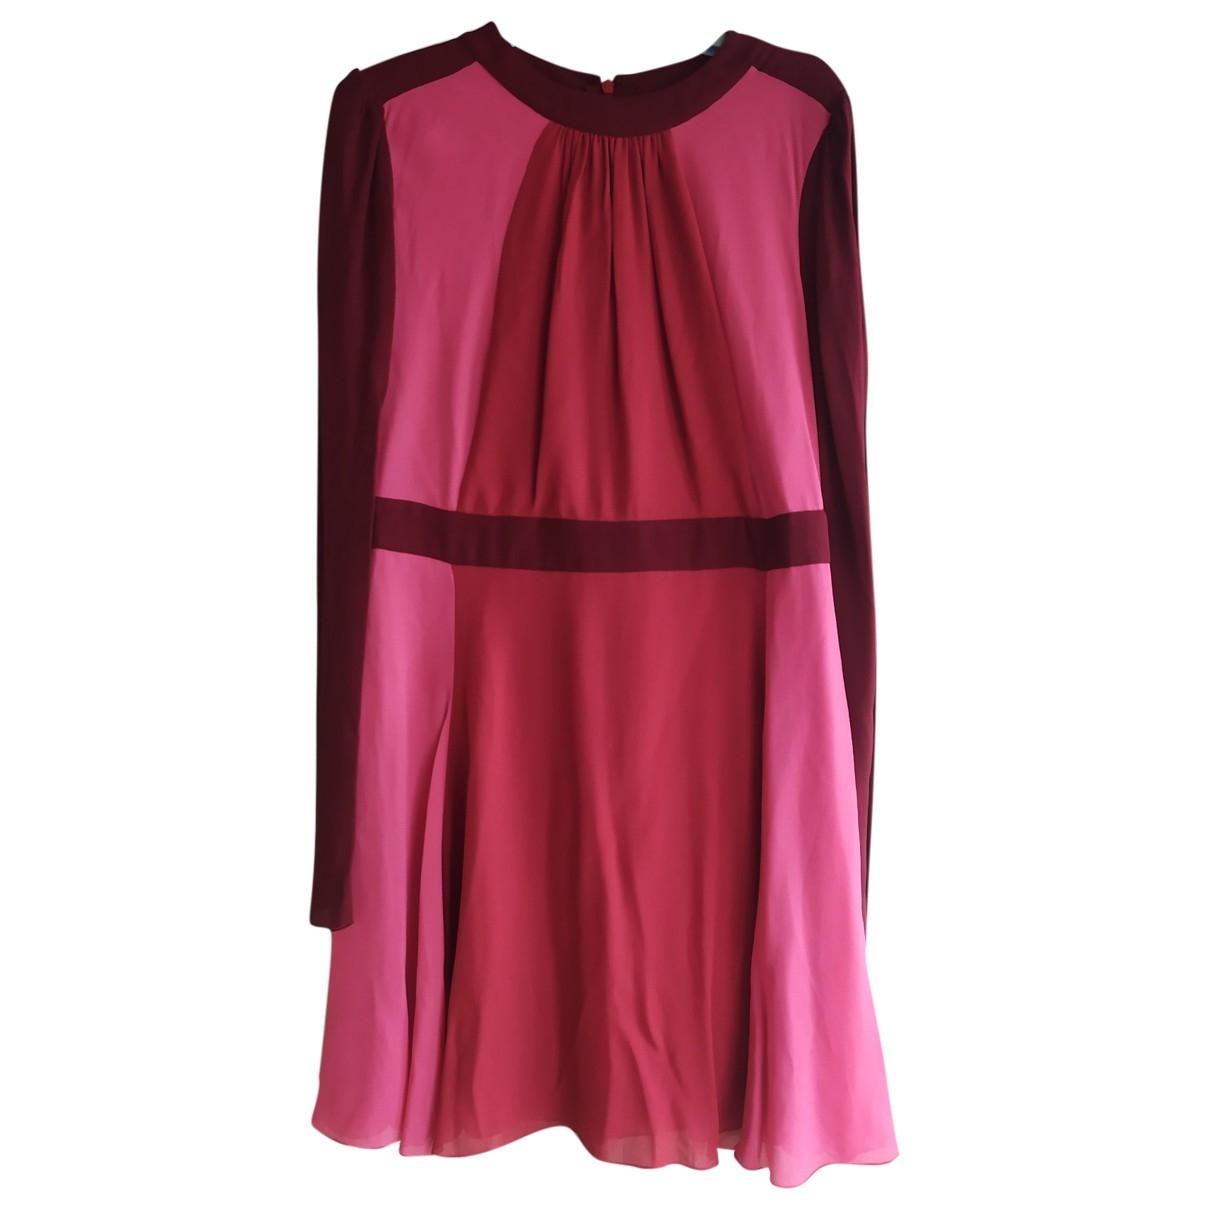 Giamba \N Kleid in  Bunt Polyester